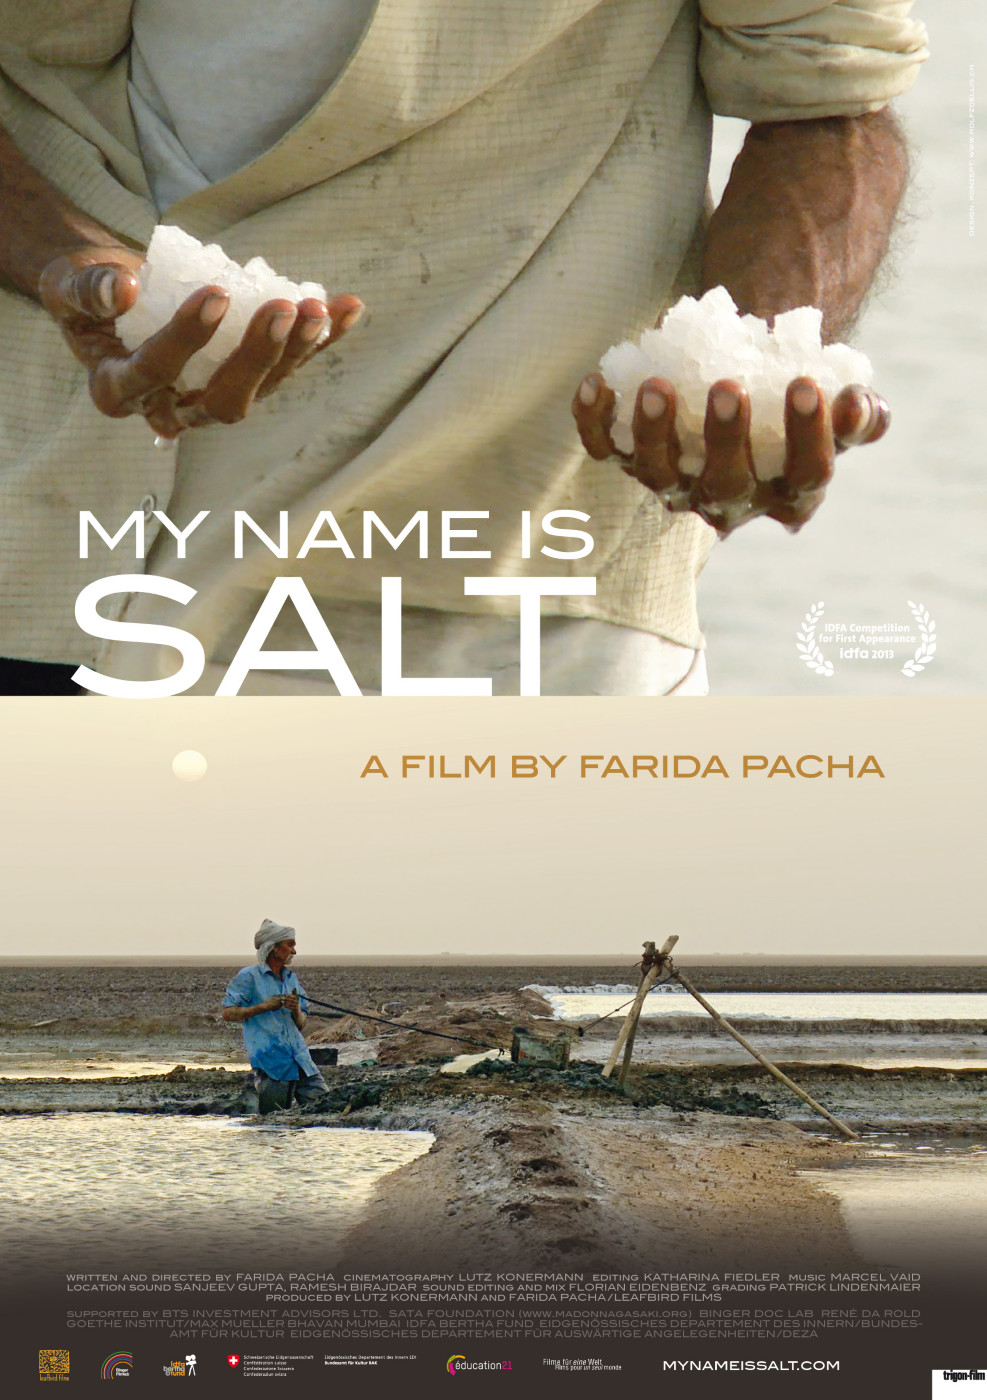 My Name Is Salt Имя мне - Соль